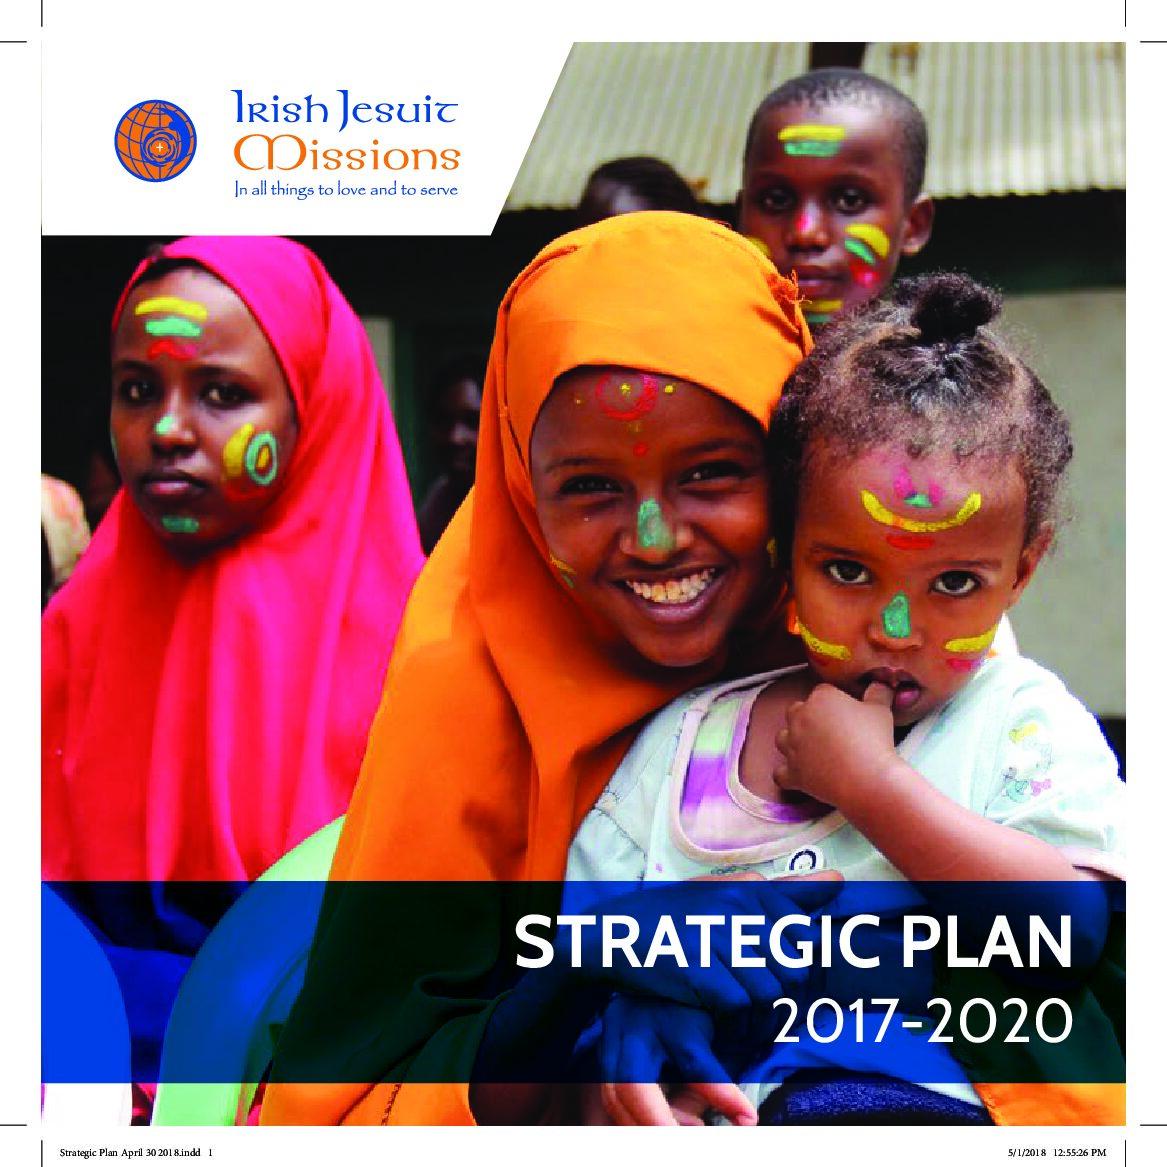 Strategic PLan 2017 - 2020